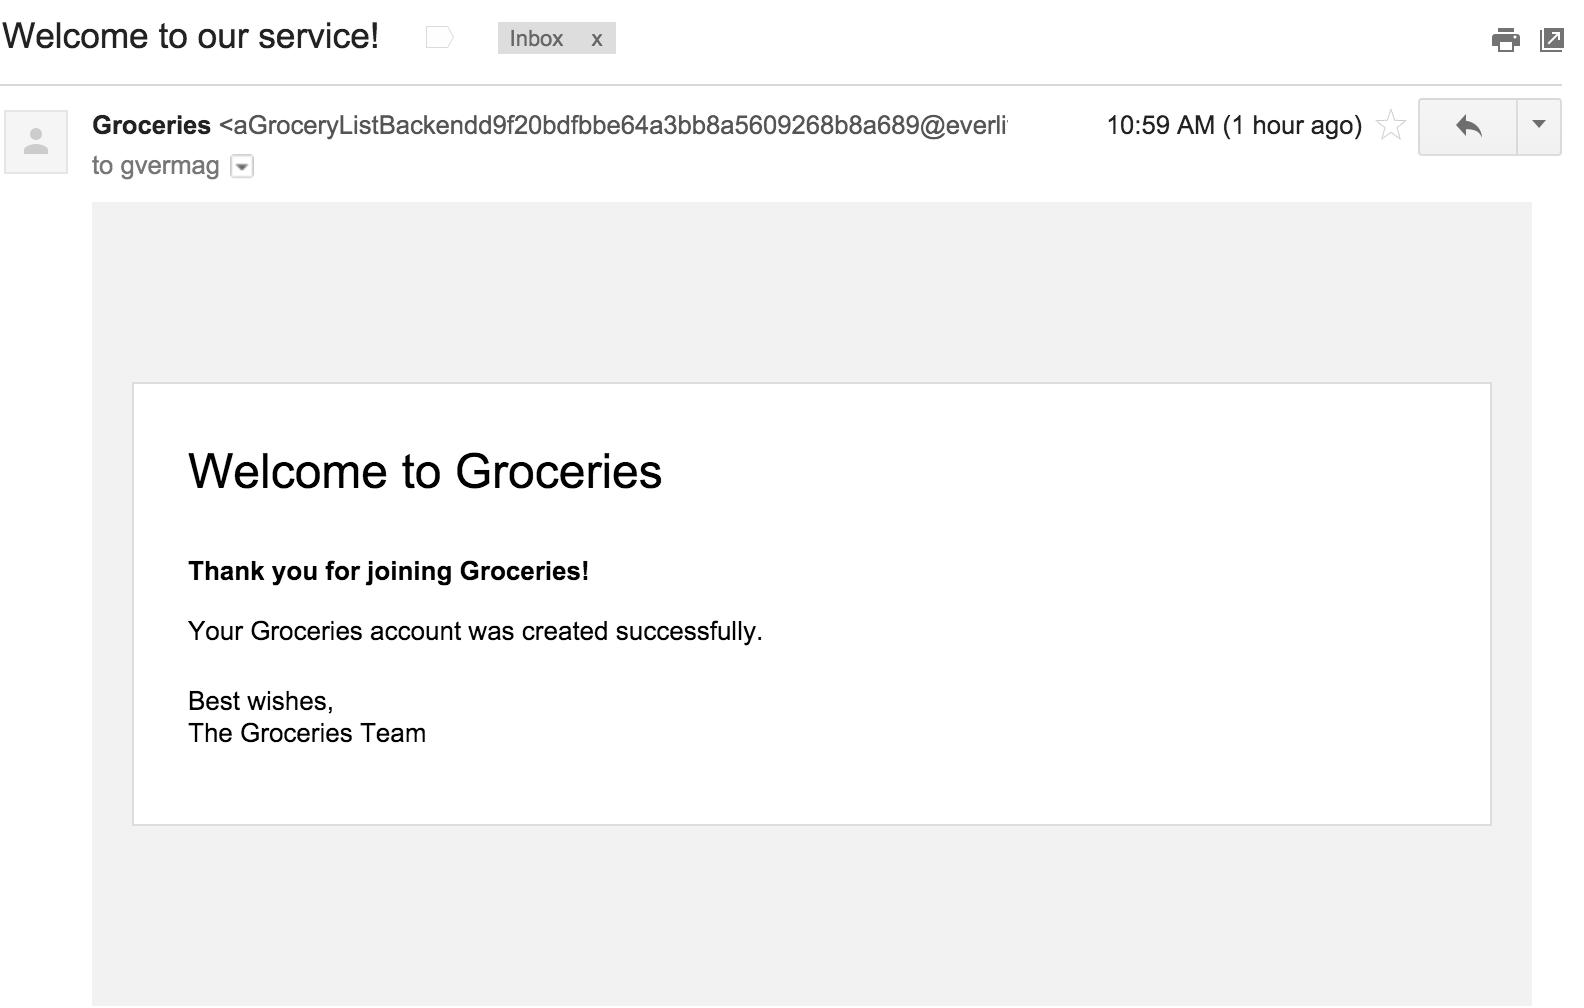 NativeScript_Groceries_App_Confirm